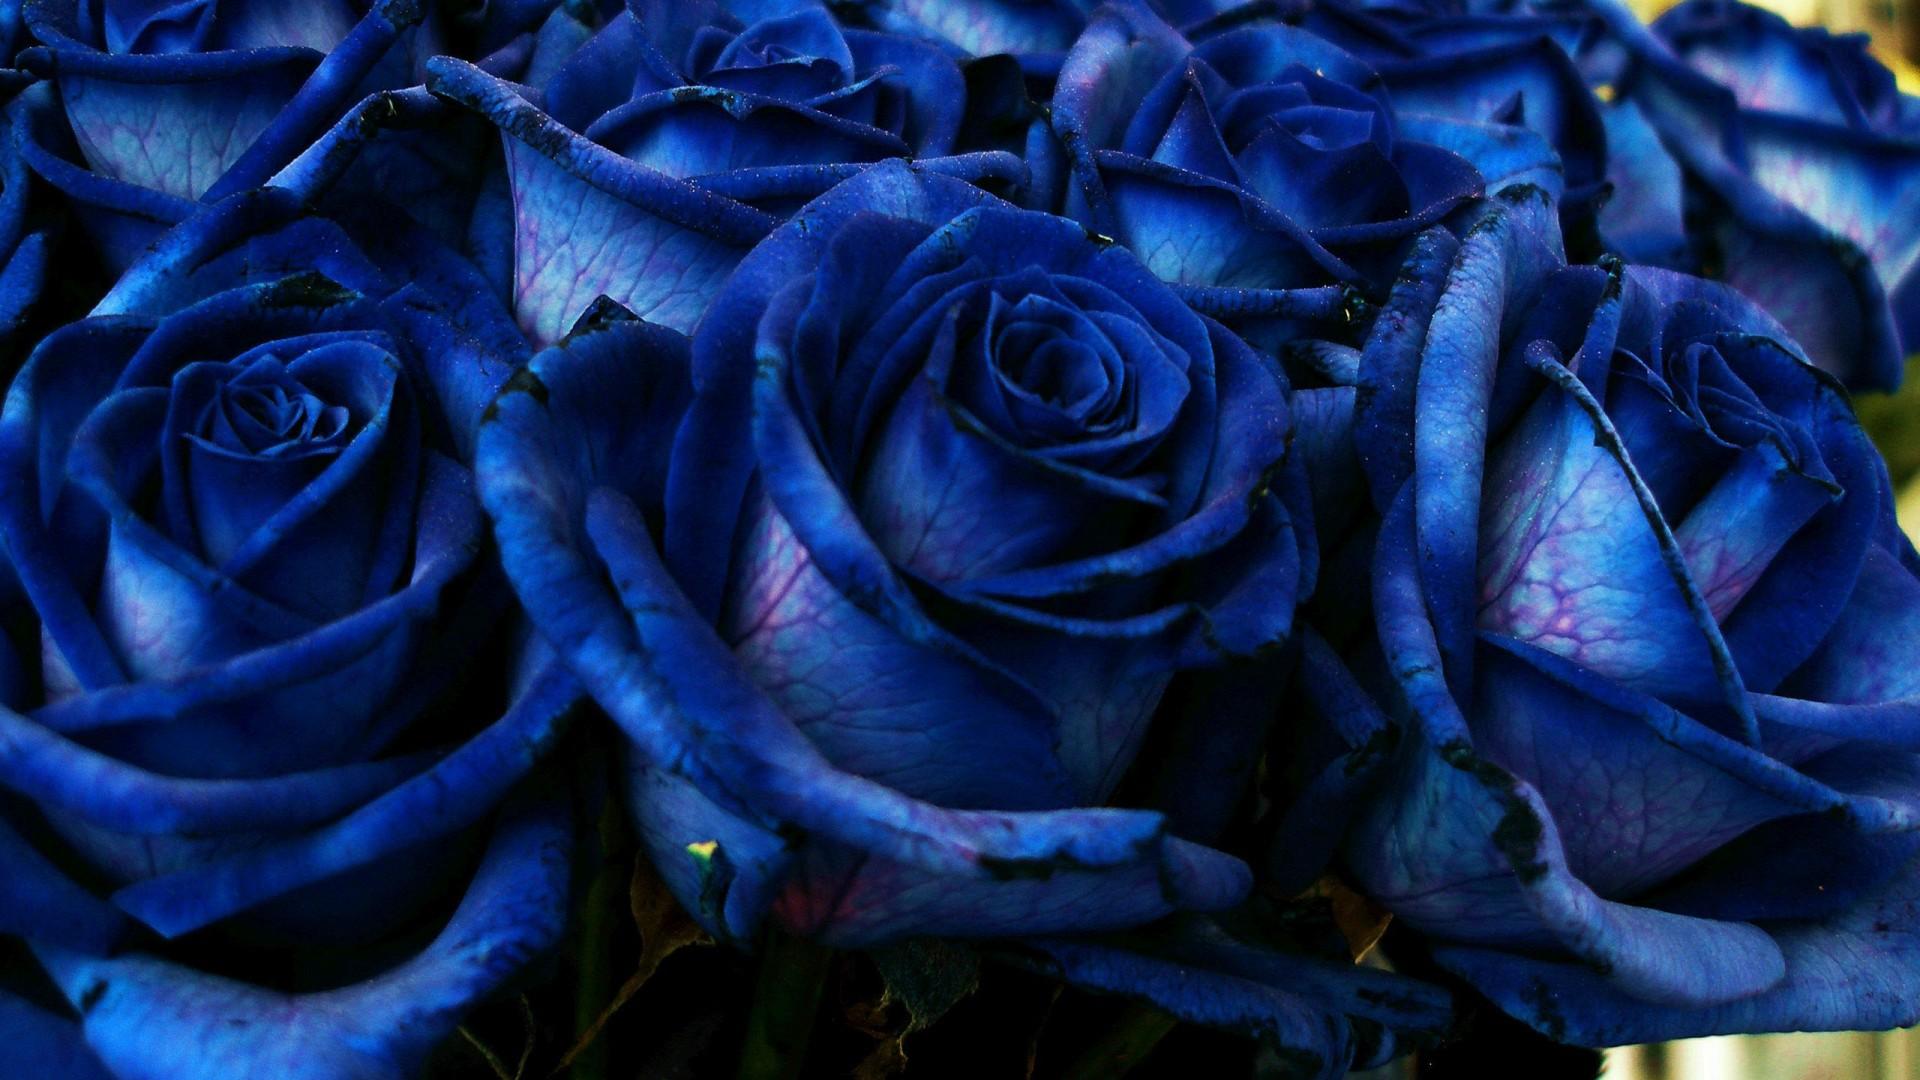 blue roses bouquet HD Wallpaper